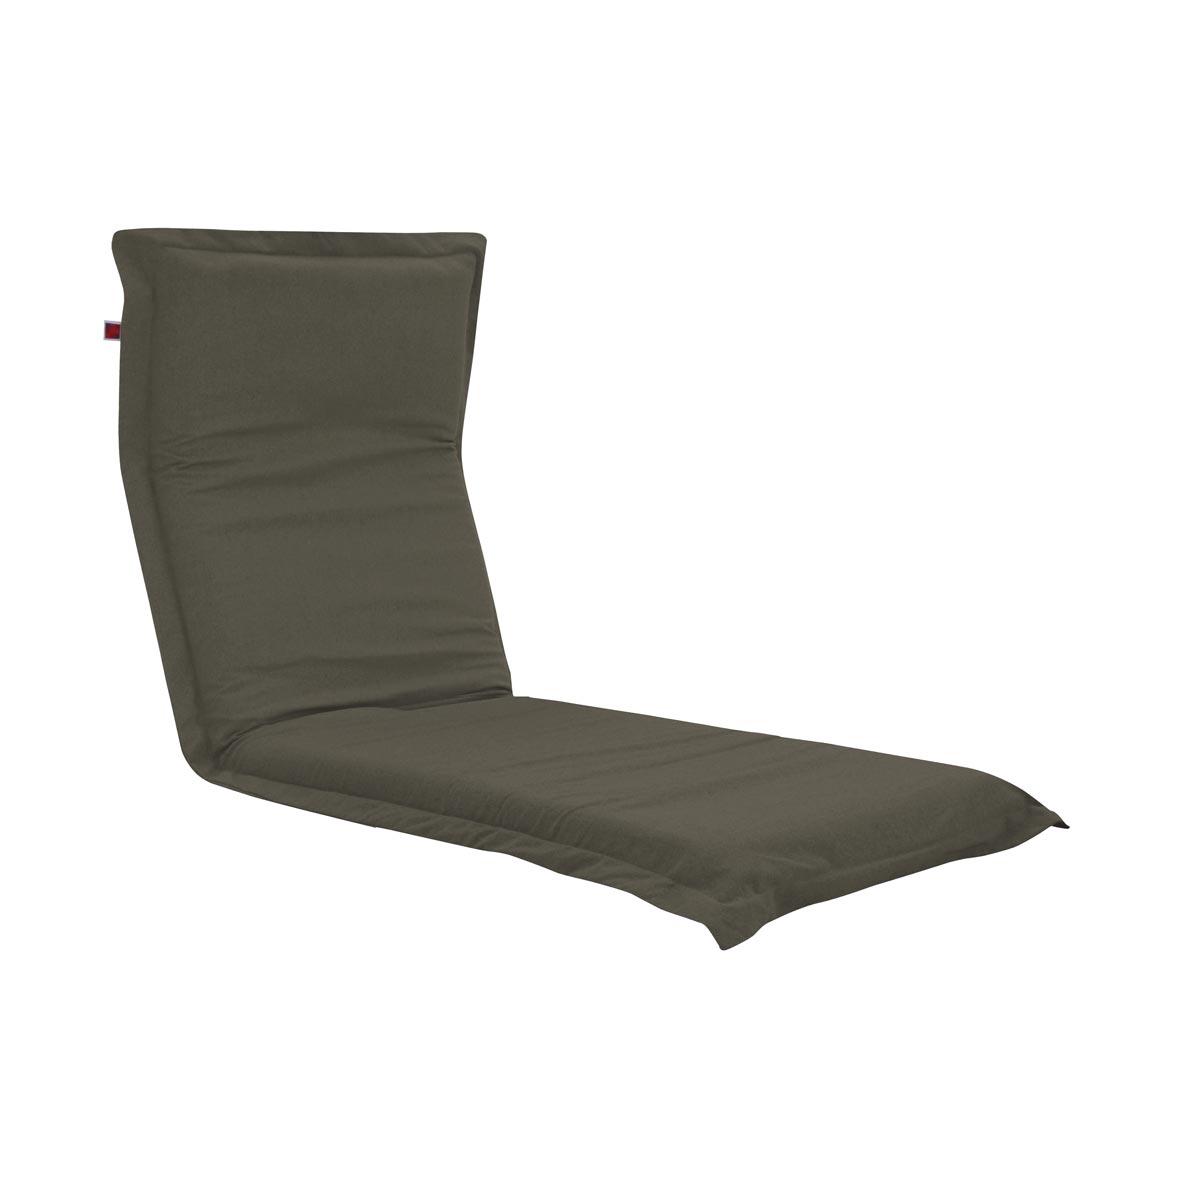 Pufe ClicClac Uno Lounge Tecido Ecolona Caqui 02 03b